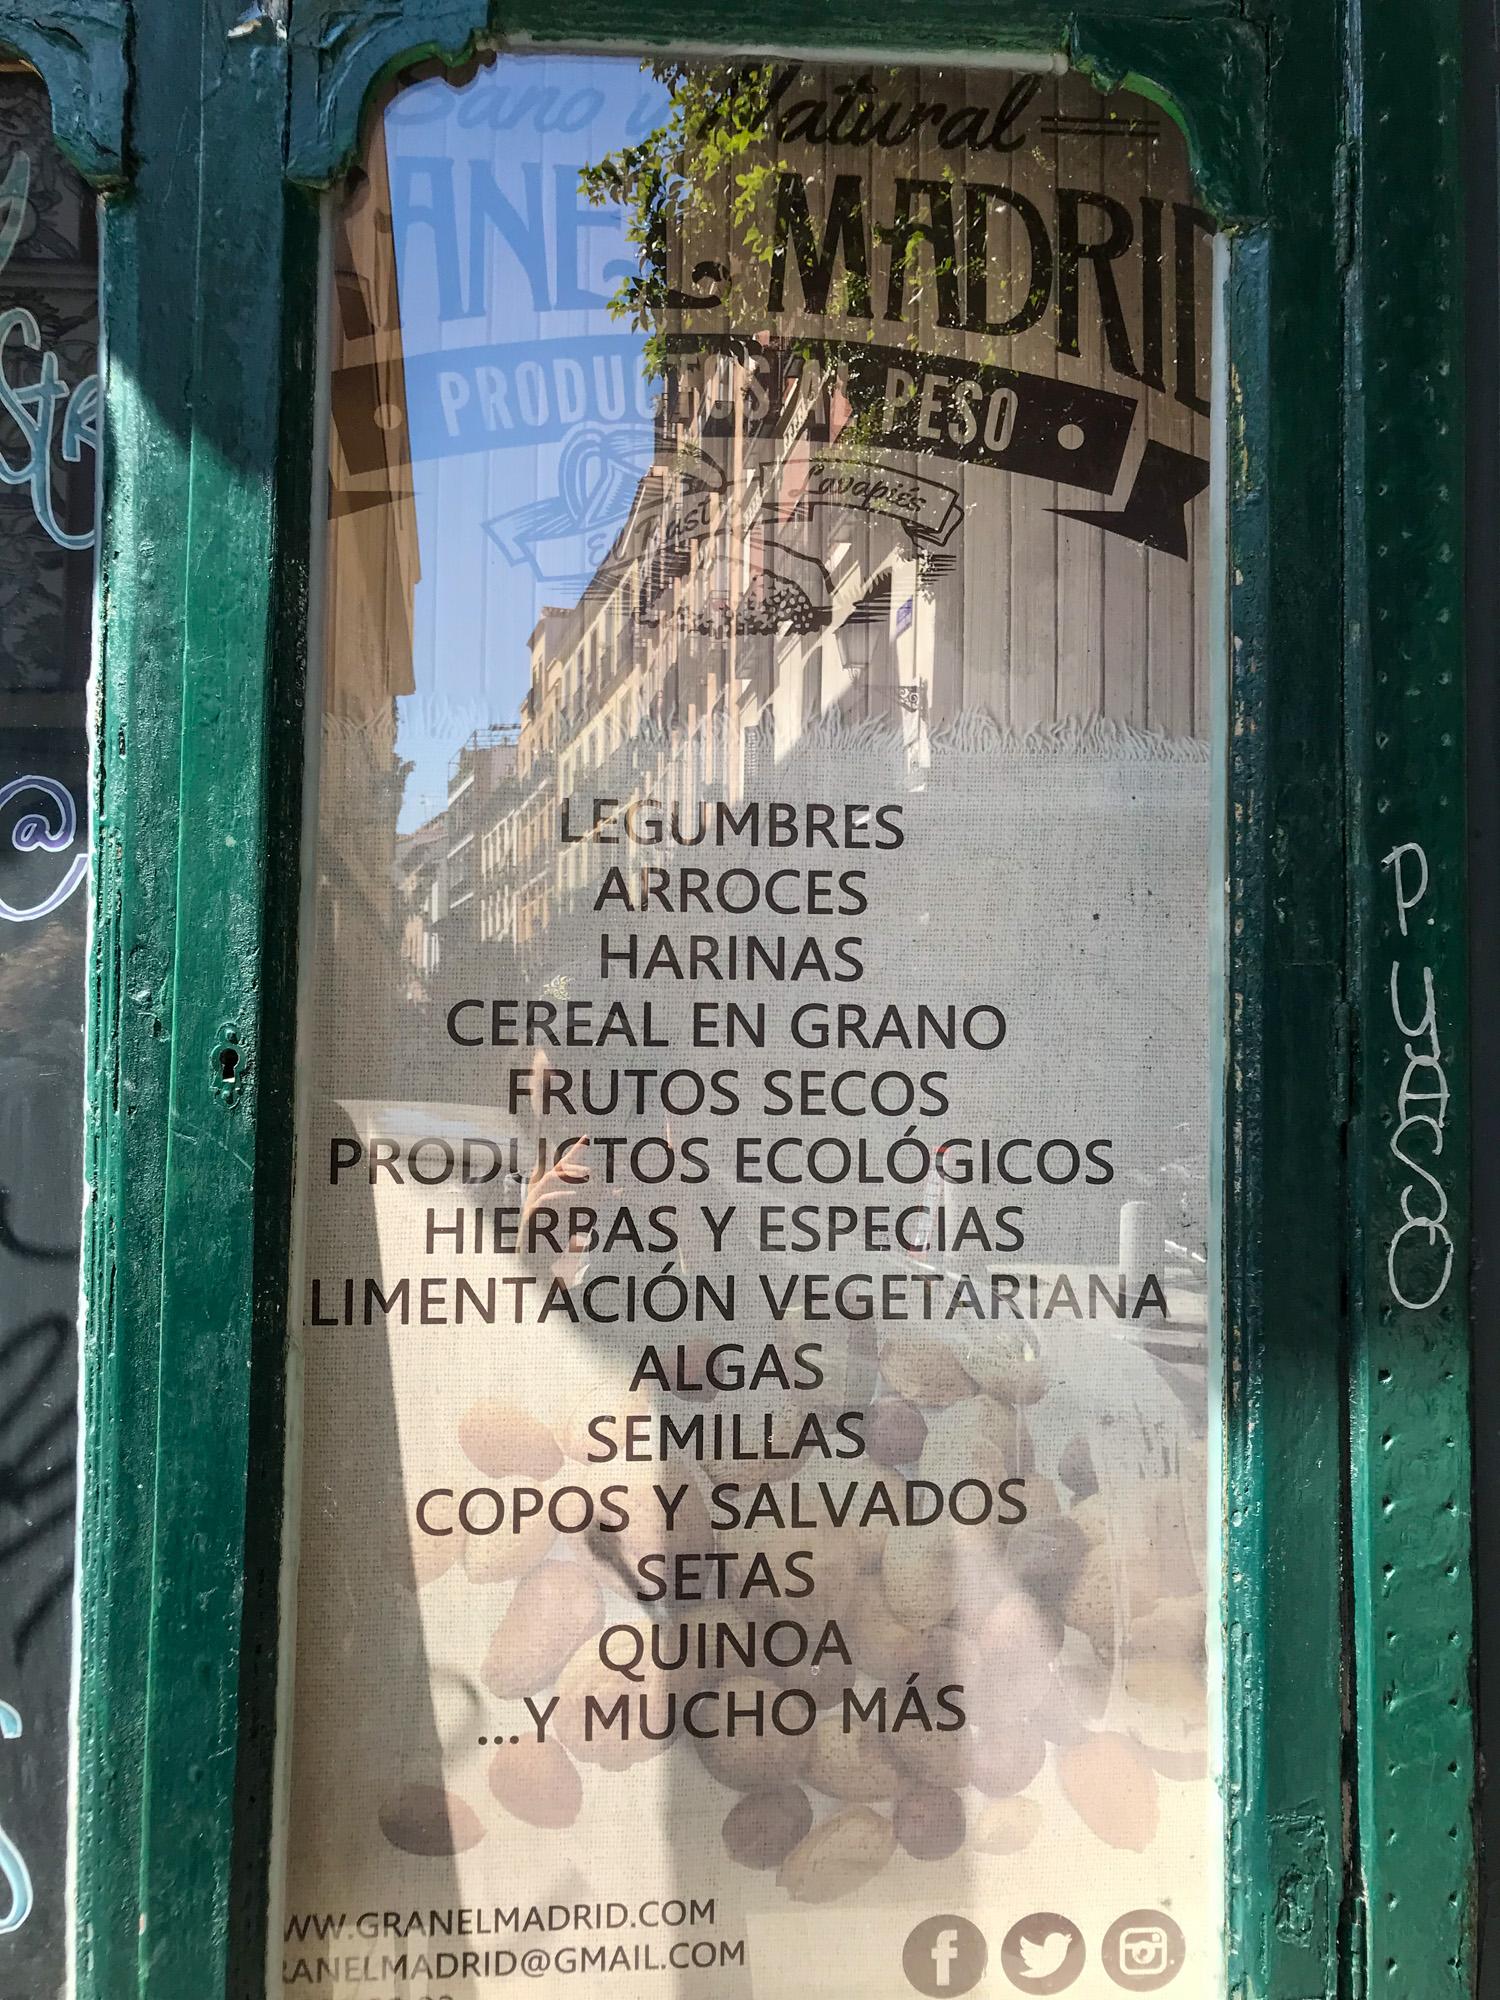 Granel Madrid Zero Waste